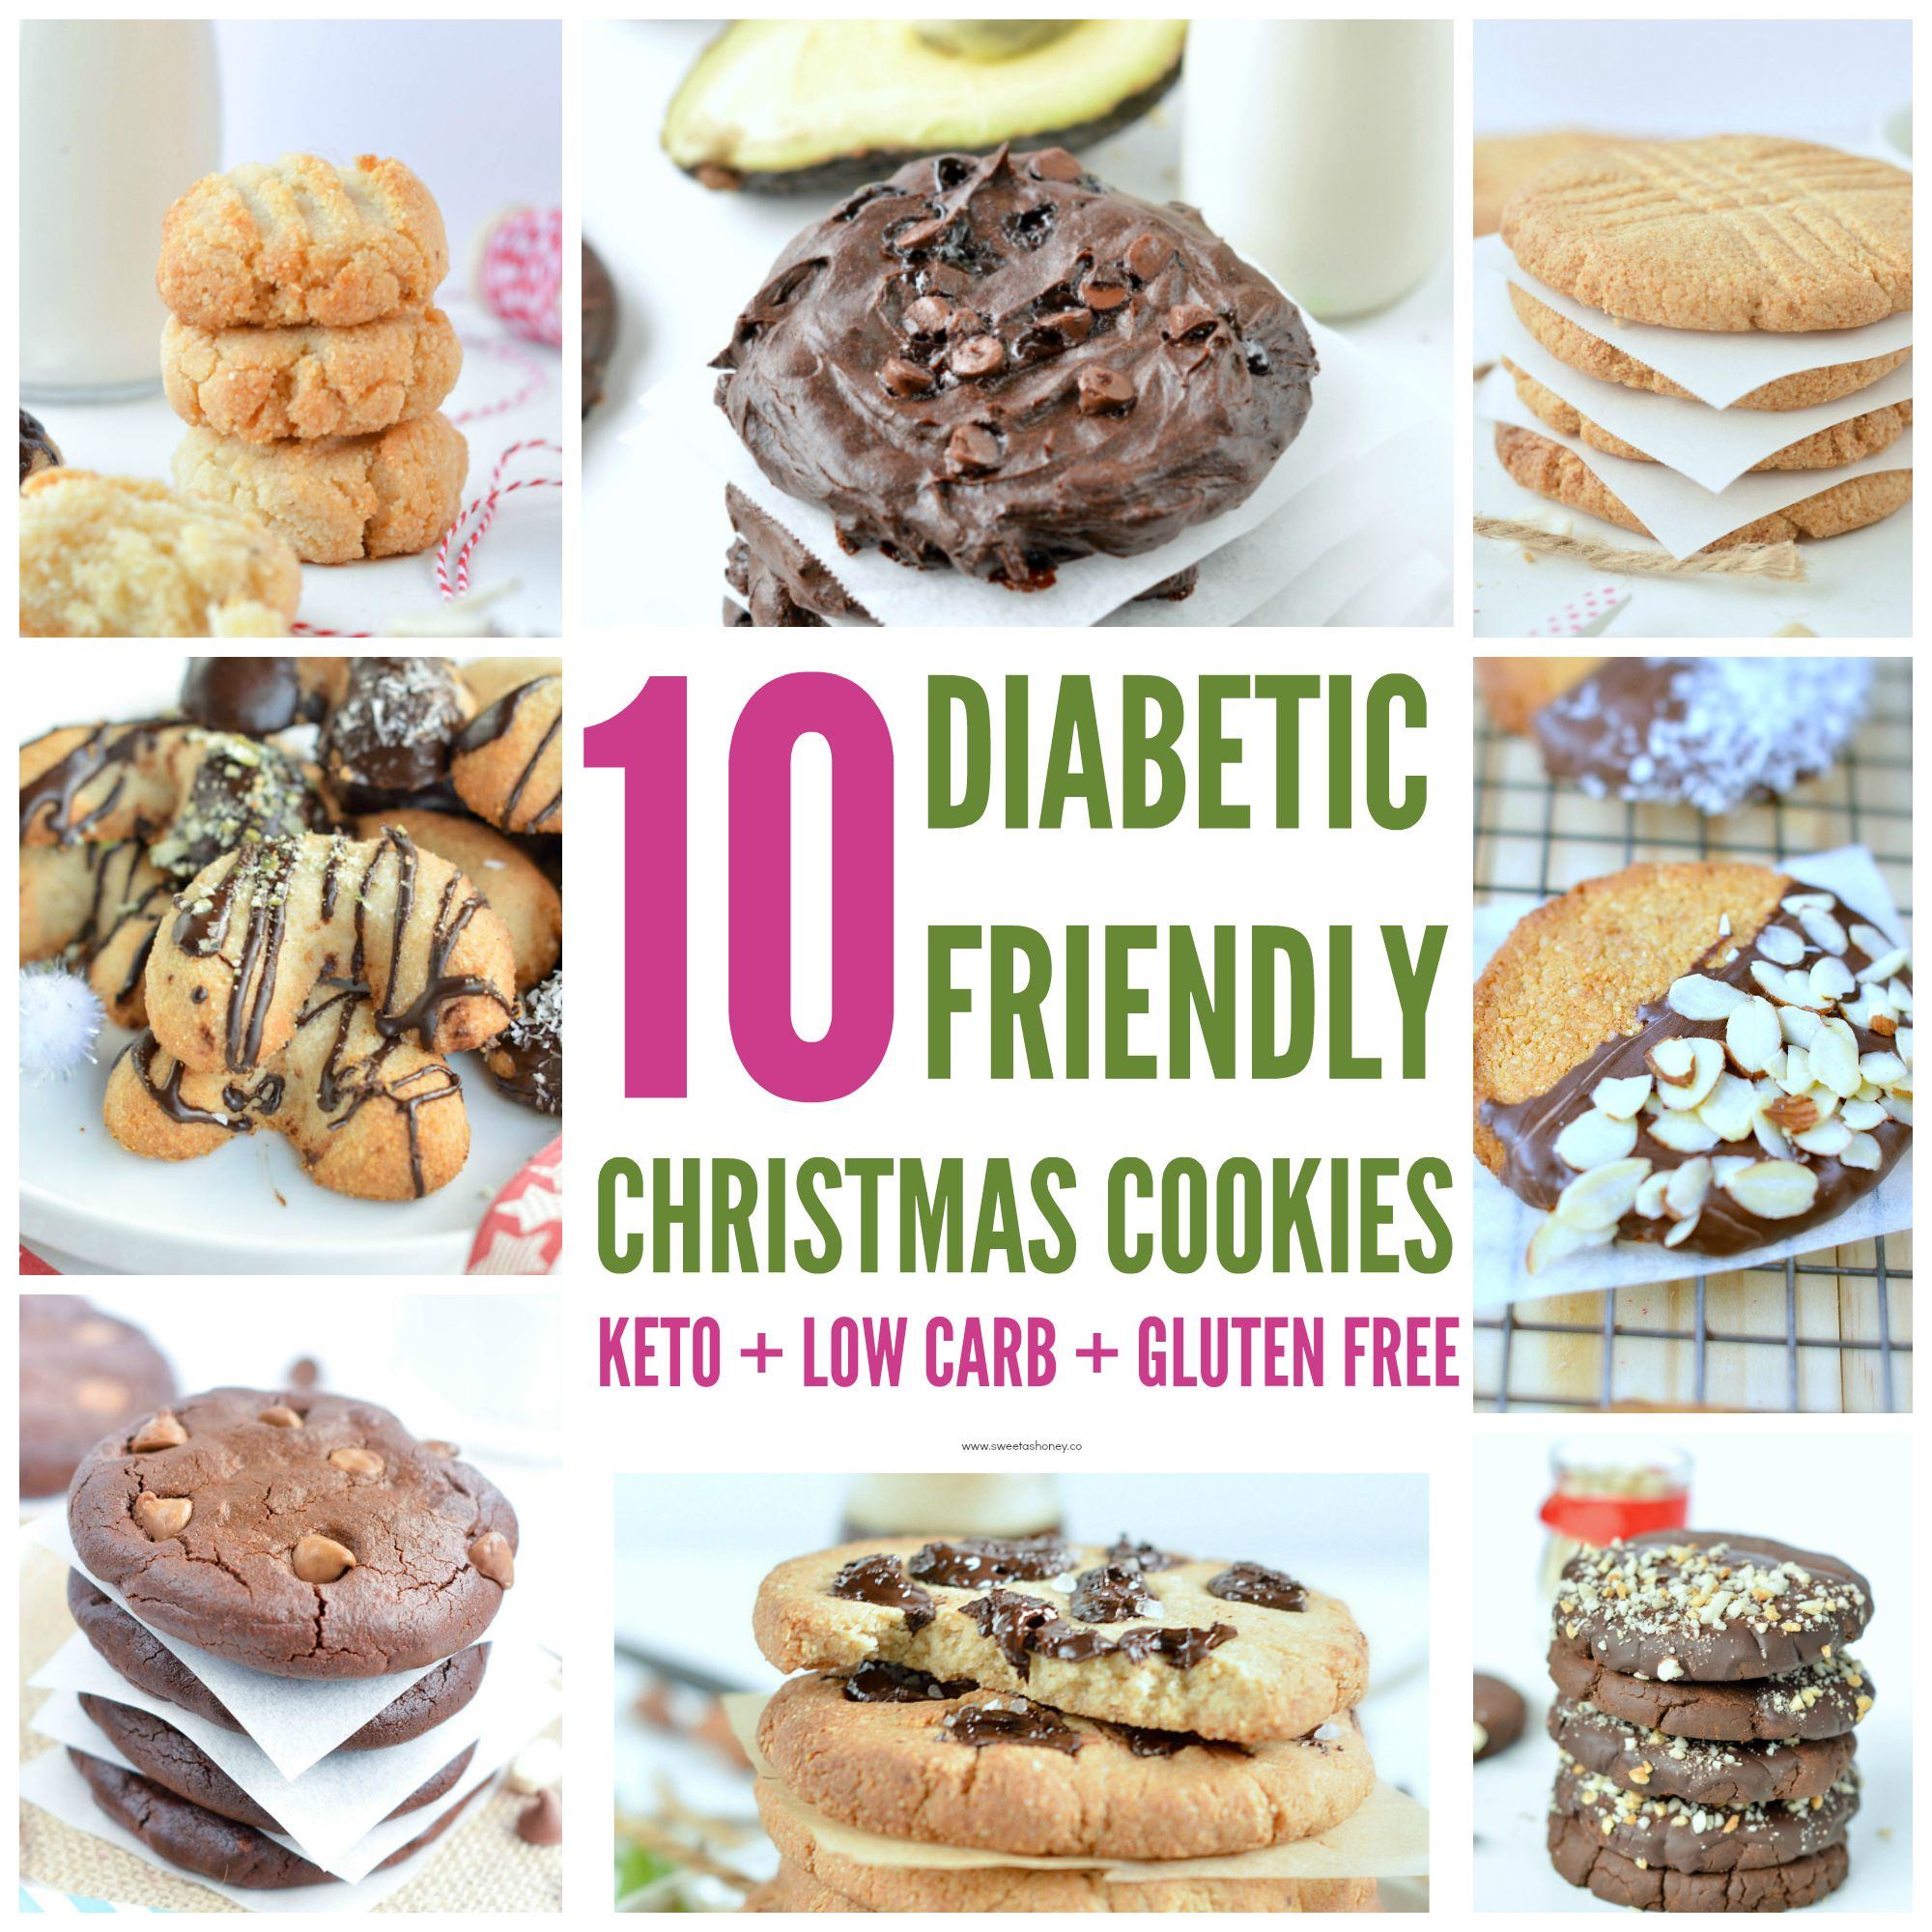 Diabetic Christmas Cookies Recipes Ideas 100 Keto Low Carb Gluten Free Almond Flour Cookies Recipes Christmas Sugar Free Cookies Diabetic Cookie Recipes